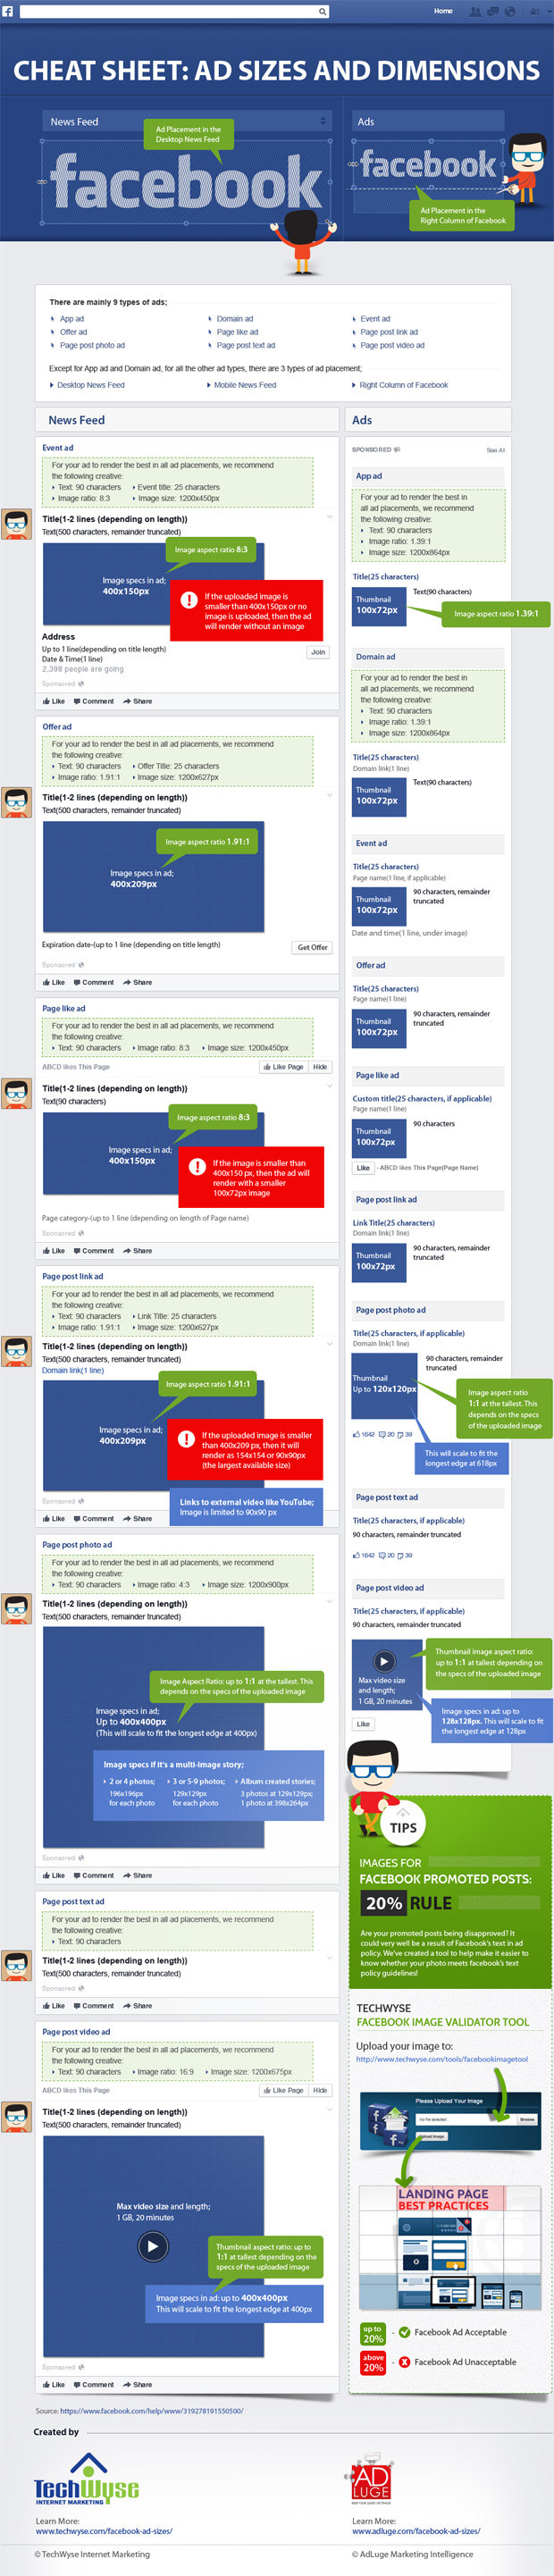 Facebook Ad Creative Sizes-Infographic